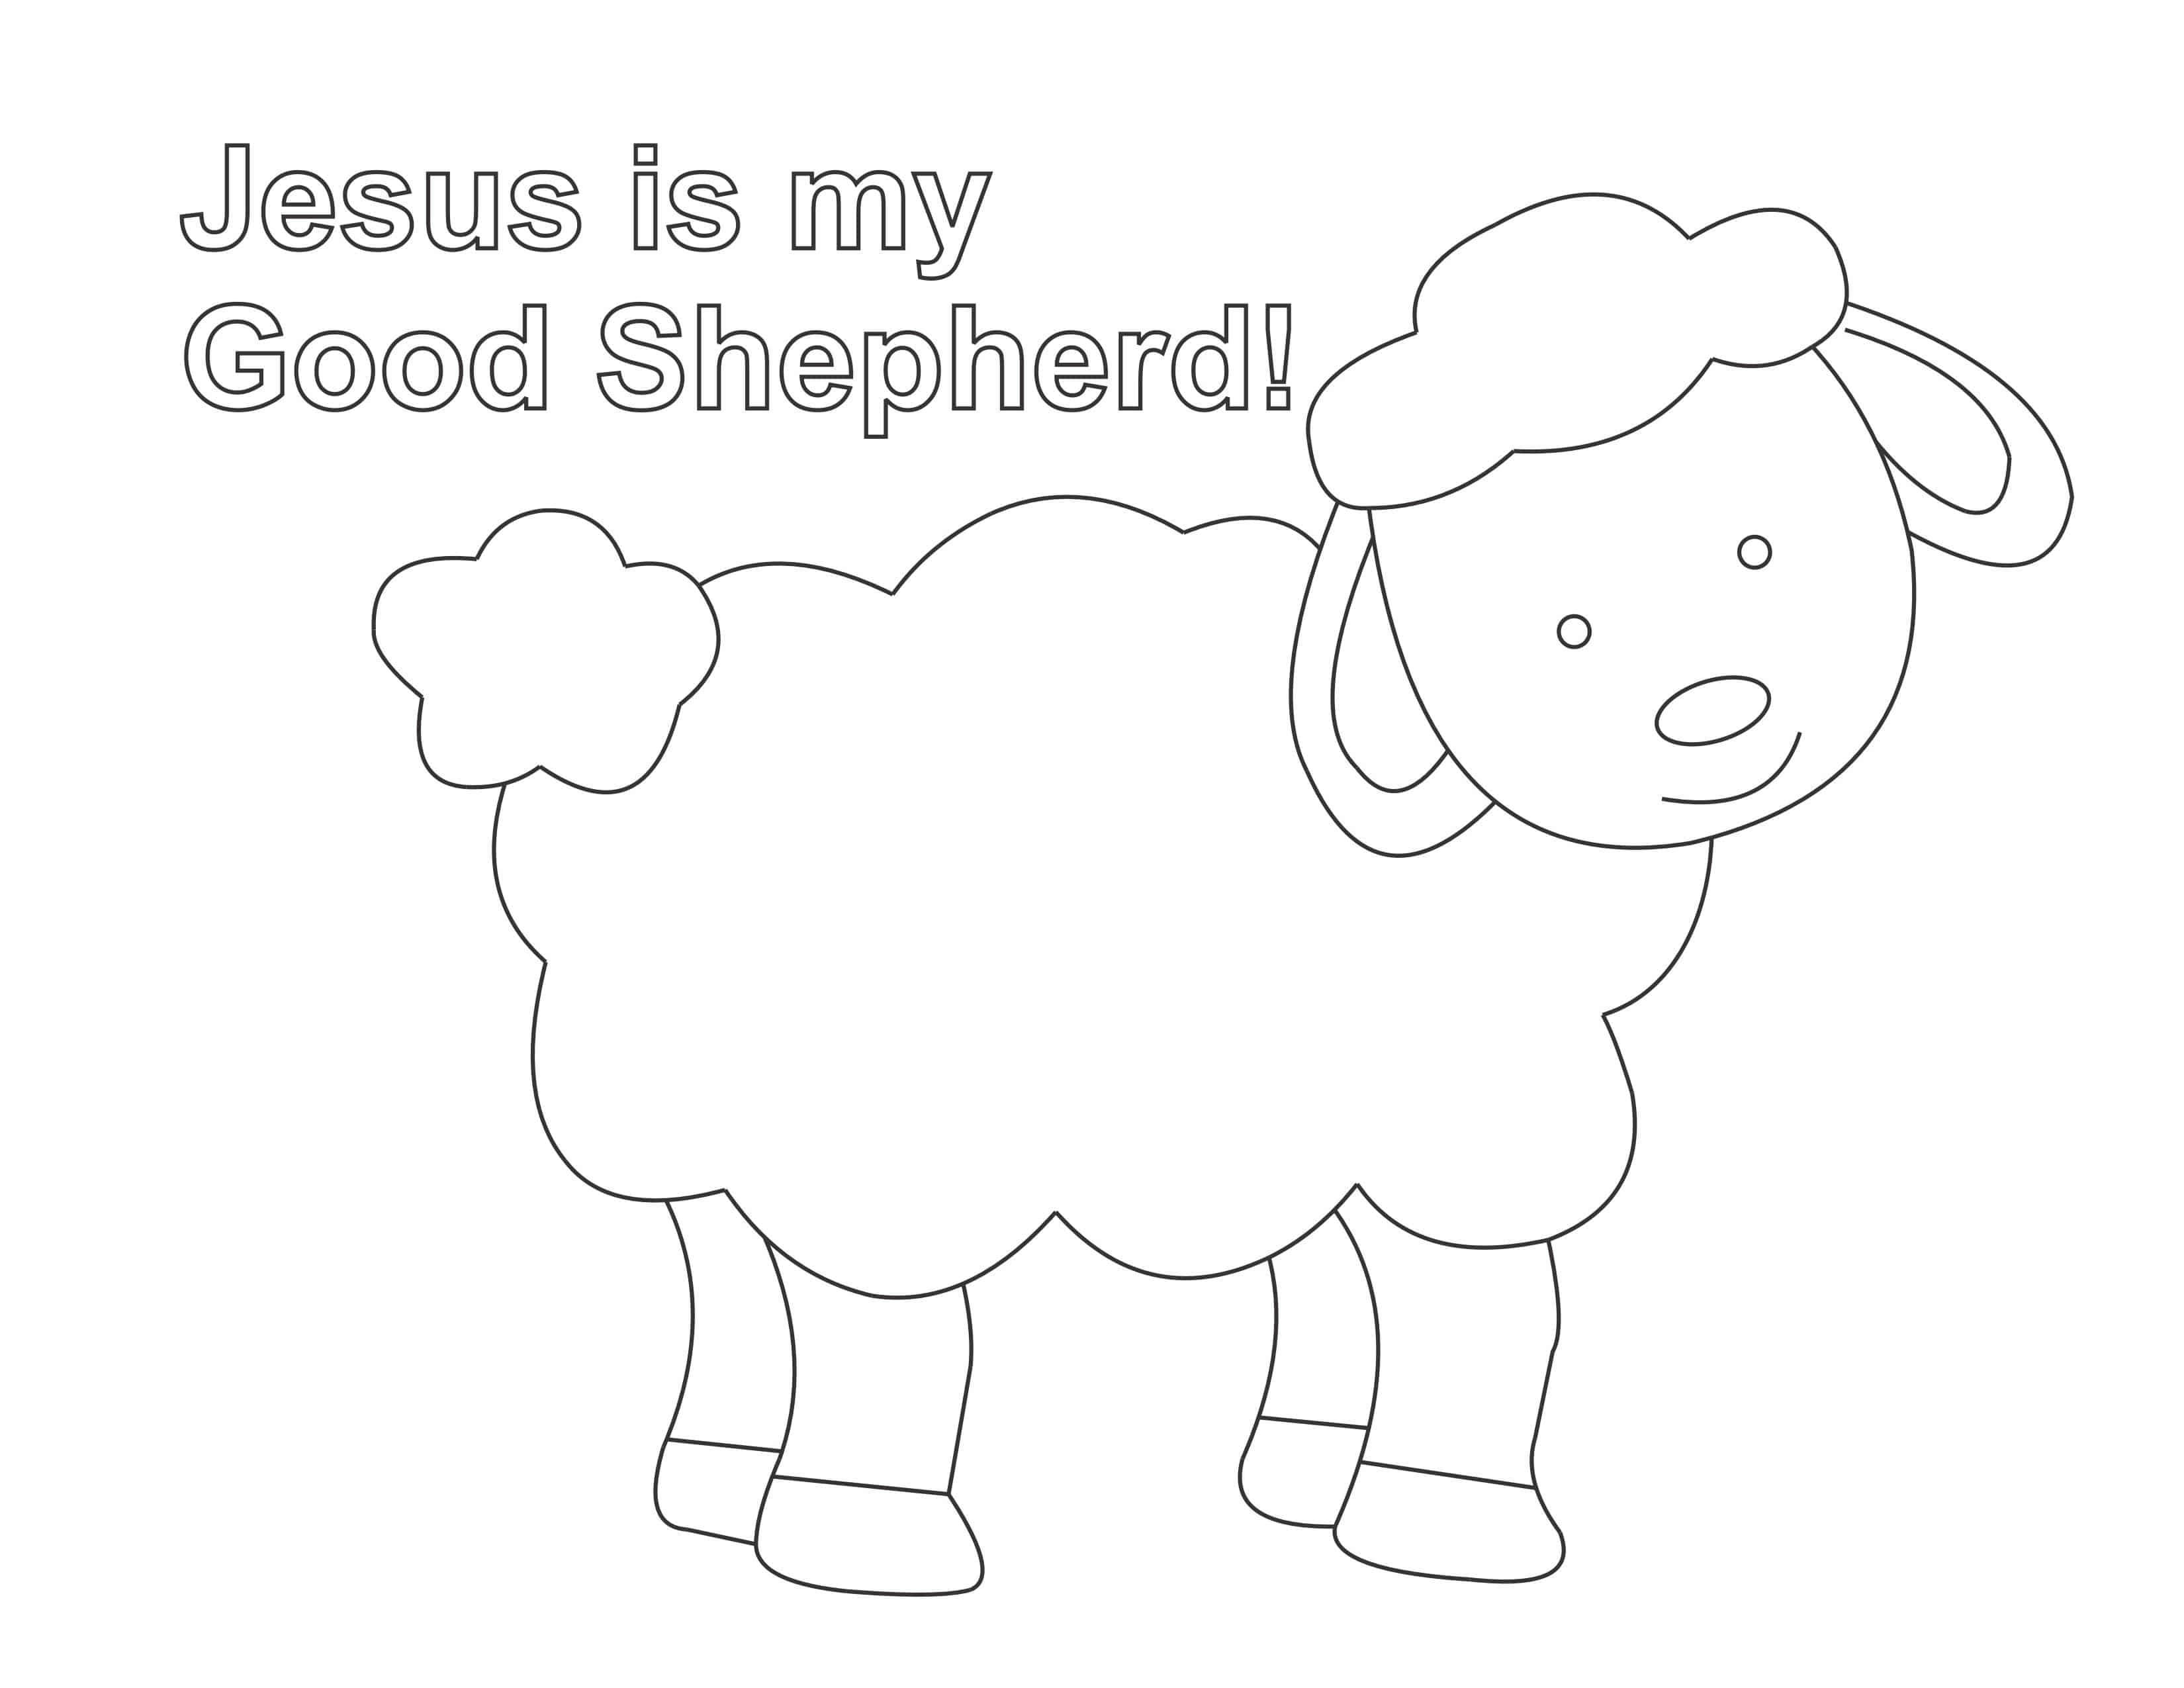 Jesus is the Good Shepherd Coloring Page Easy Print ...